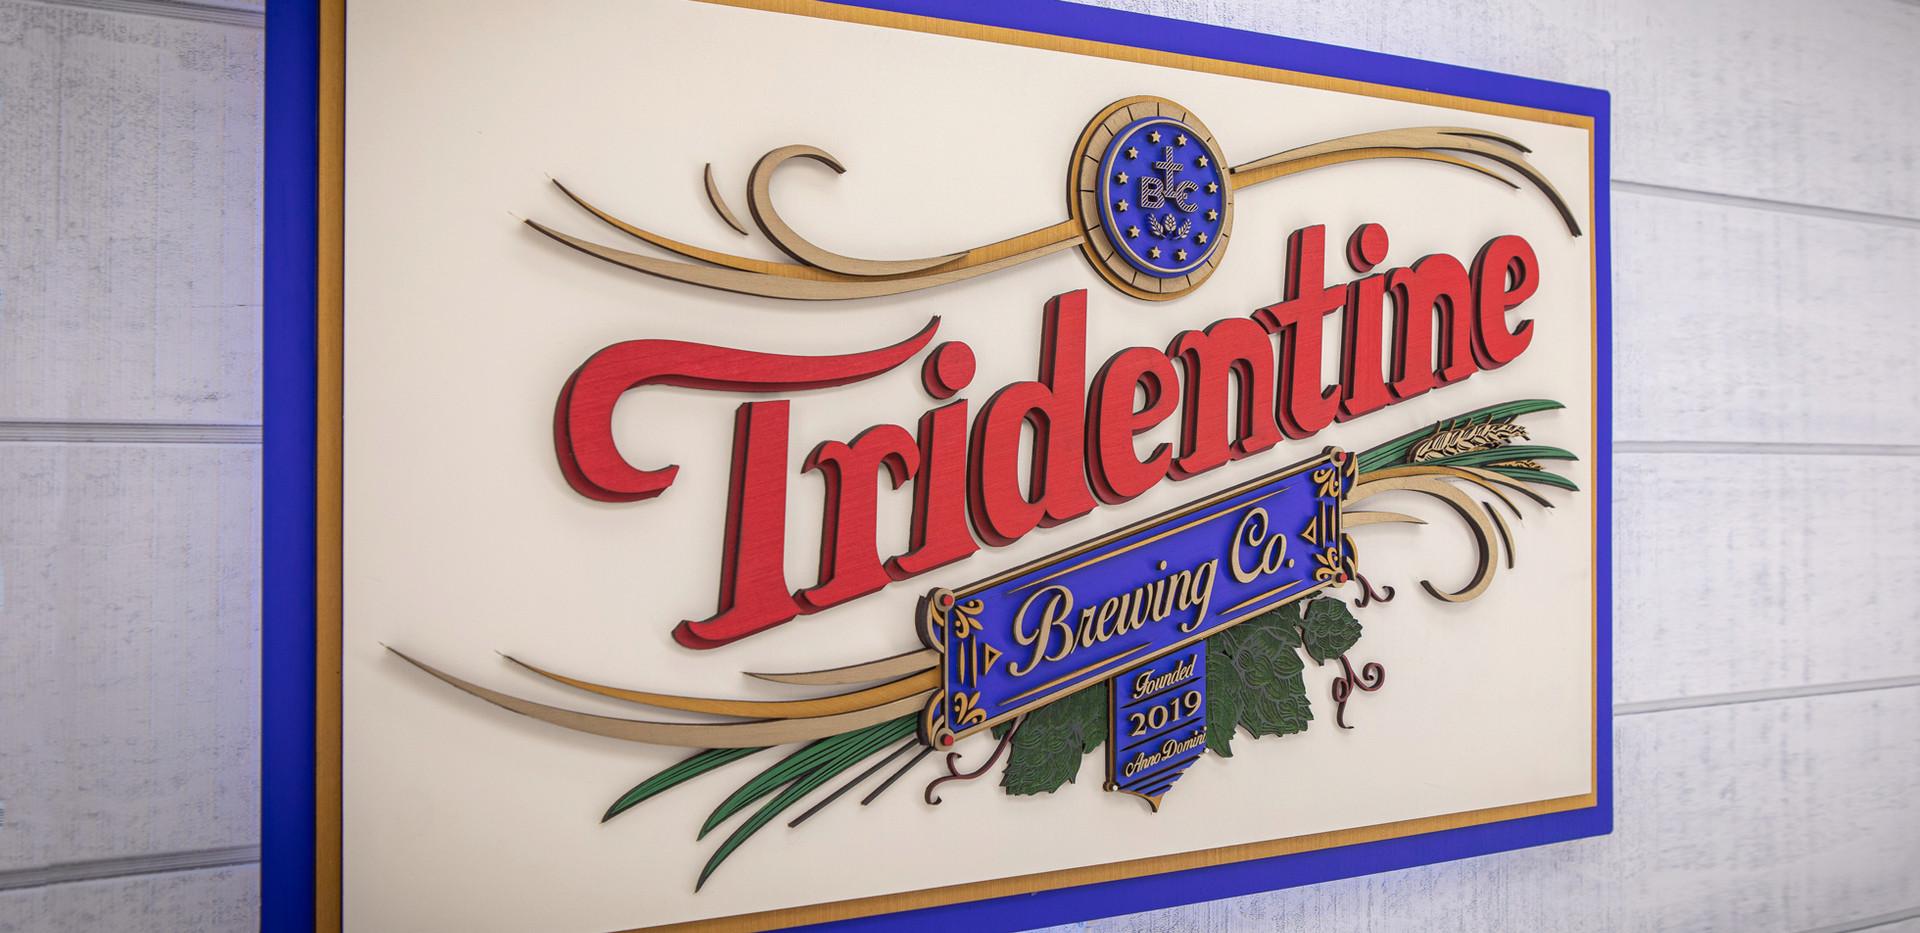 Tridentine_4.jpg